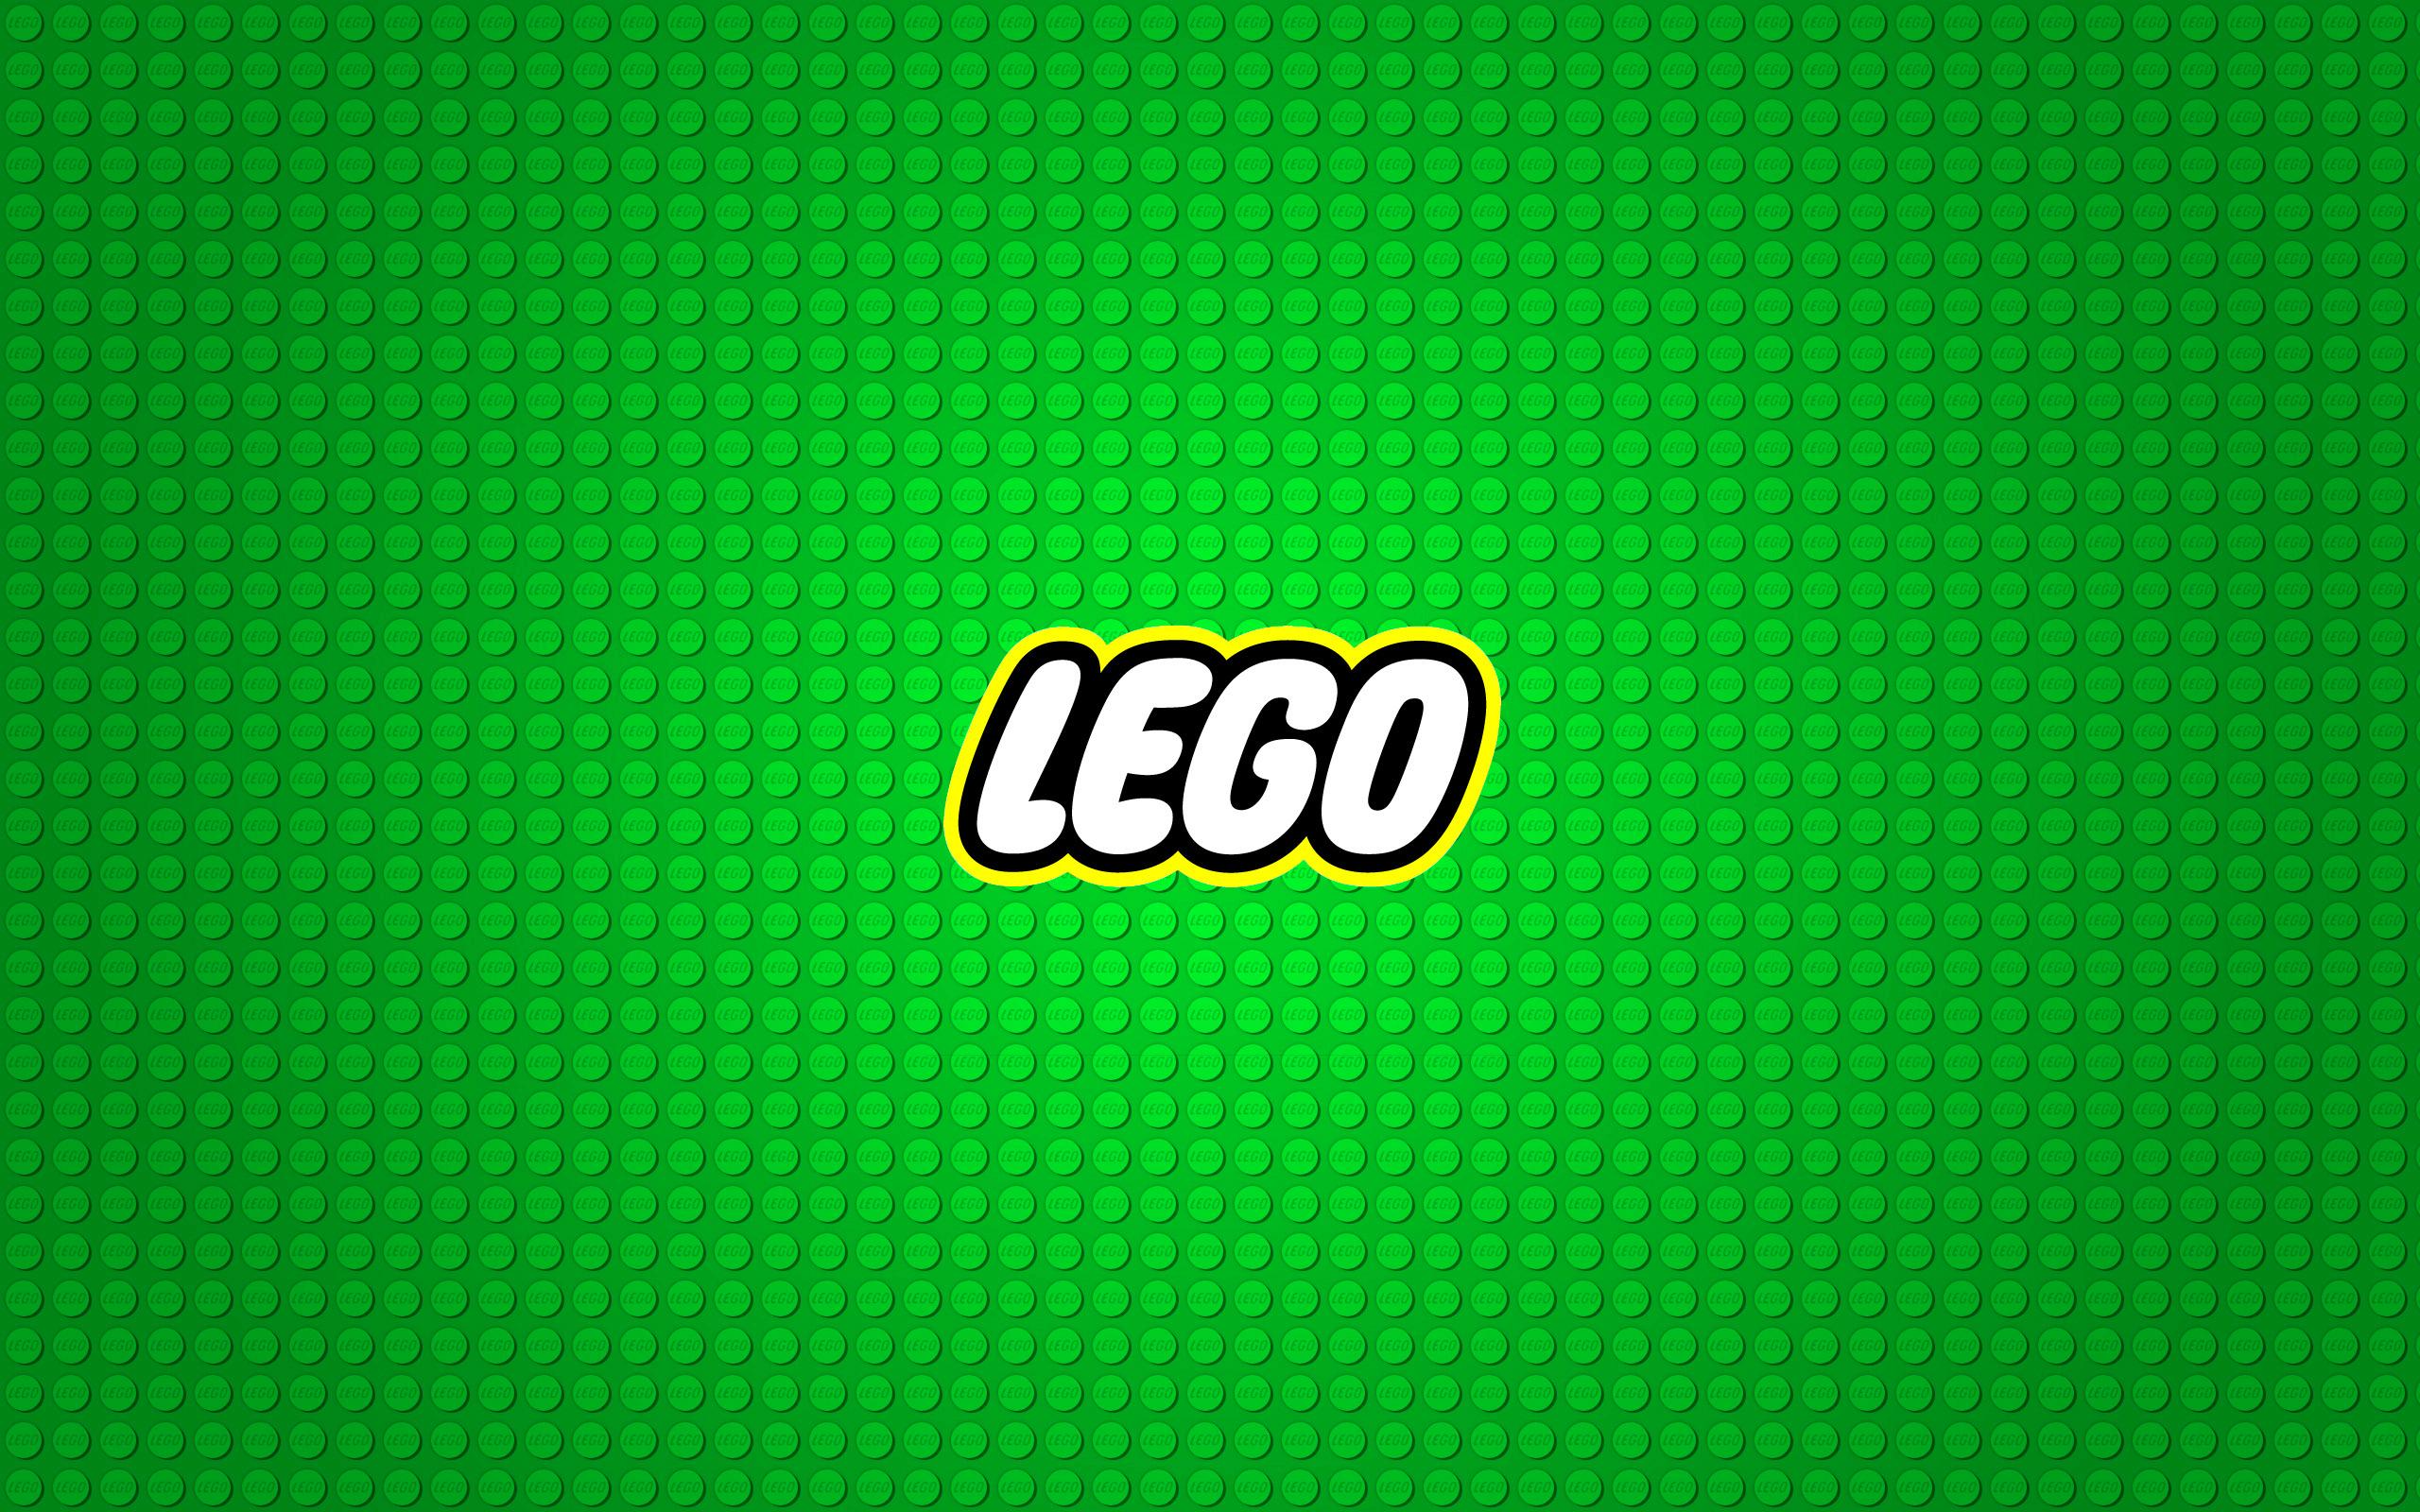 Green Lego Wallpaper HD 445 Backgrounds For Dekstop